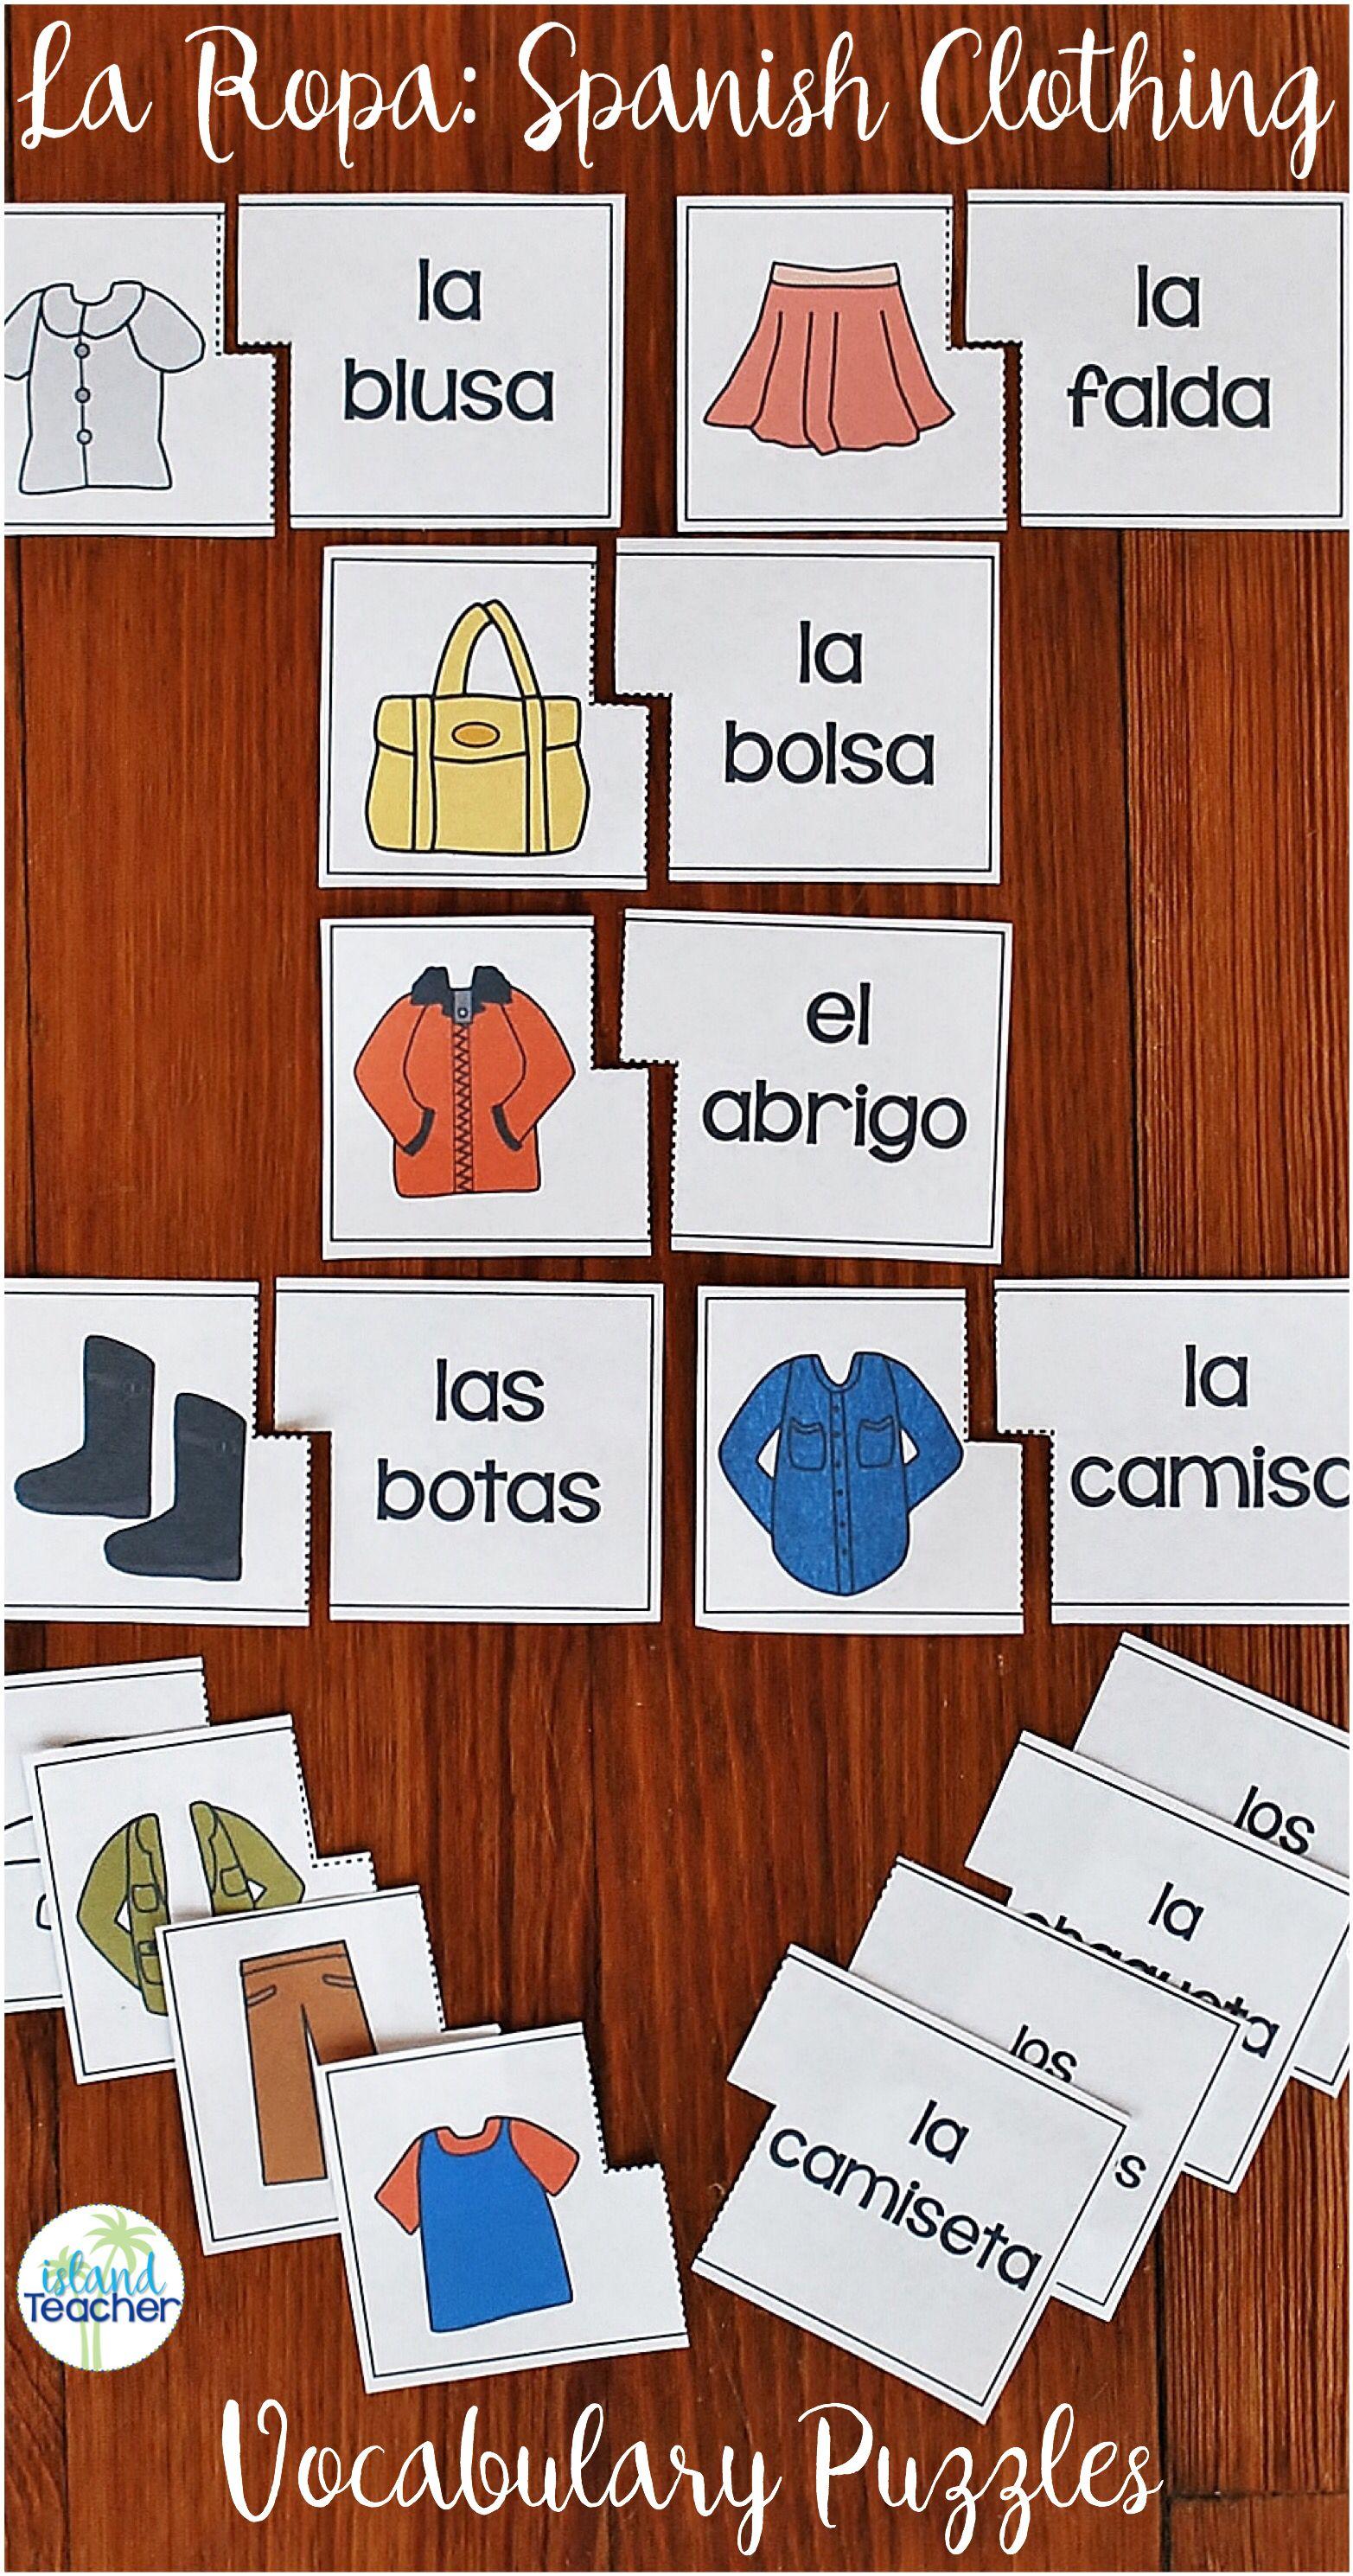 Spanish Clothing Puzzles La Ropa